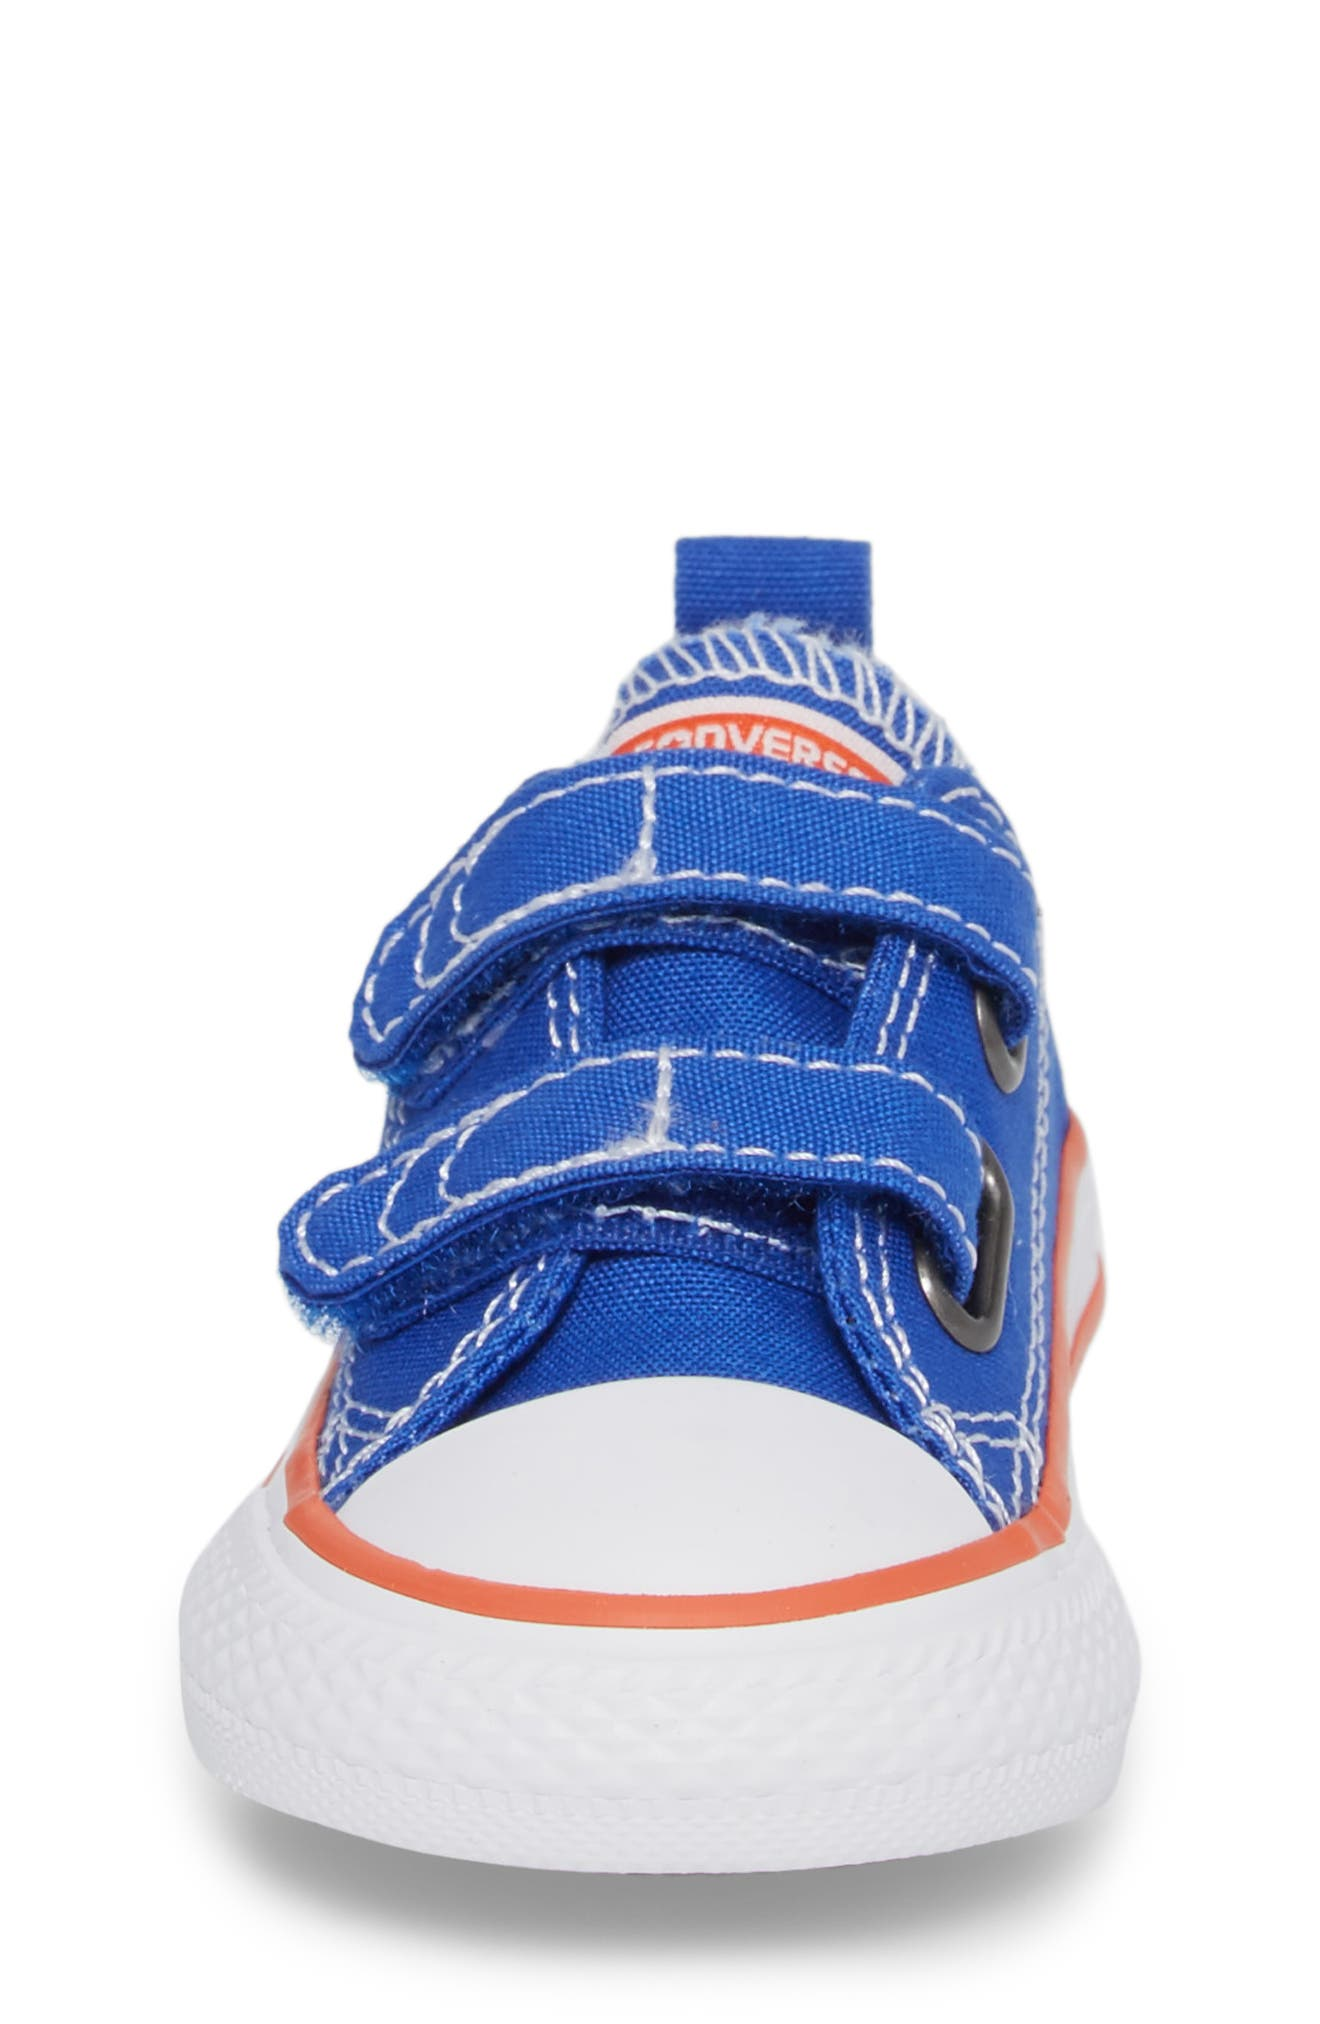 Chuck Taylor<sup>®</sup> All Star<sup>®</sup> Seasonal 2V Low Top Sneaker,                             Alternate thumbnail 4, color,                             483